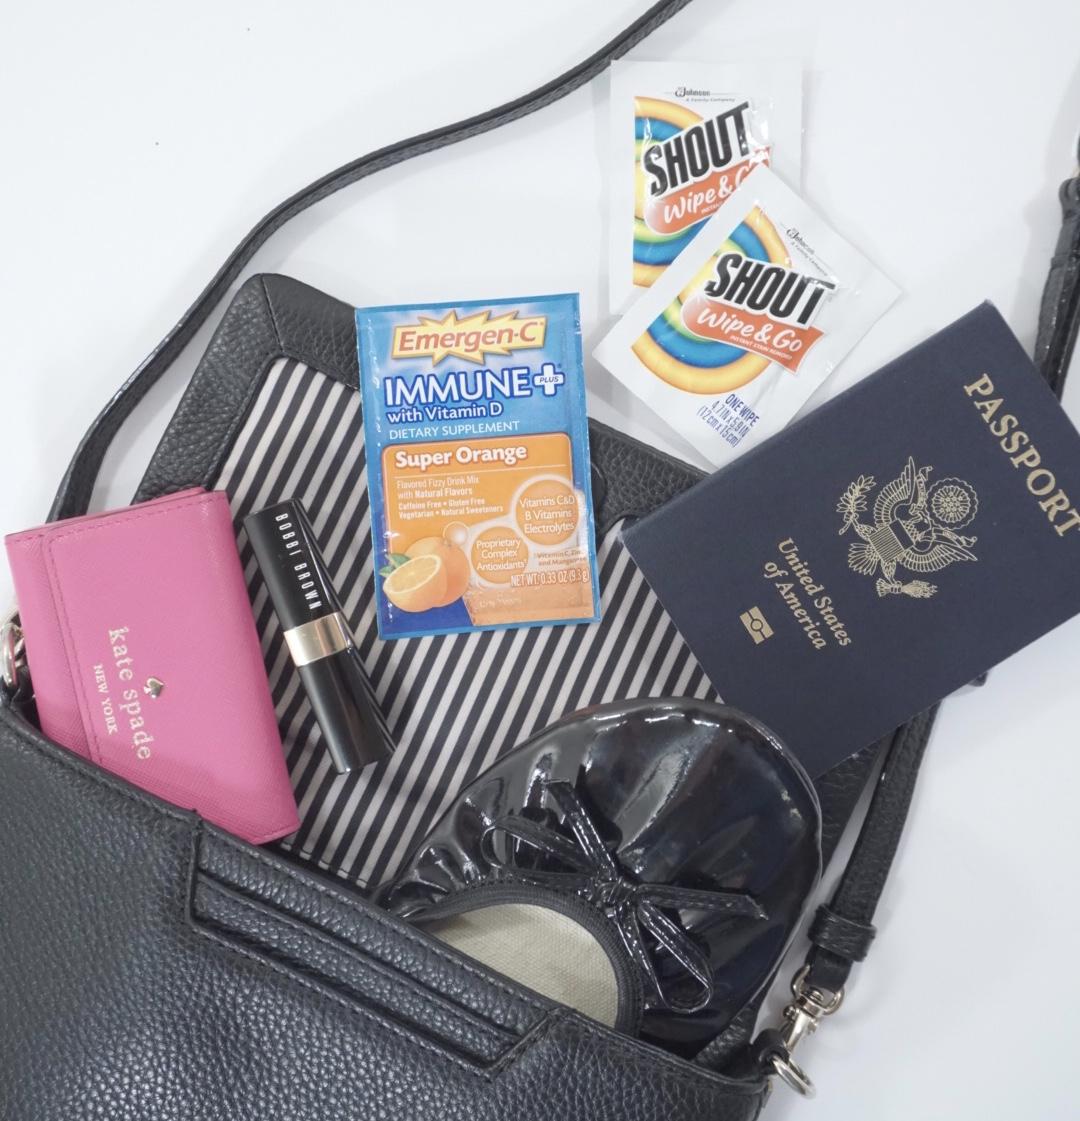 Travel Stuff 2